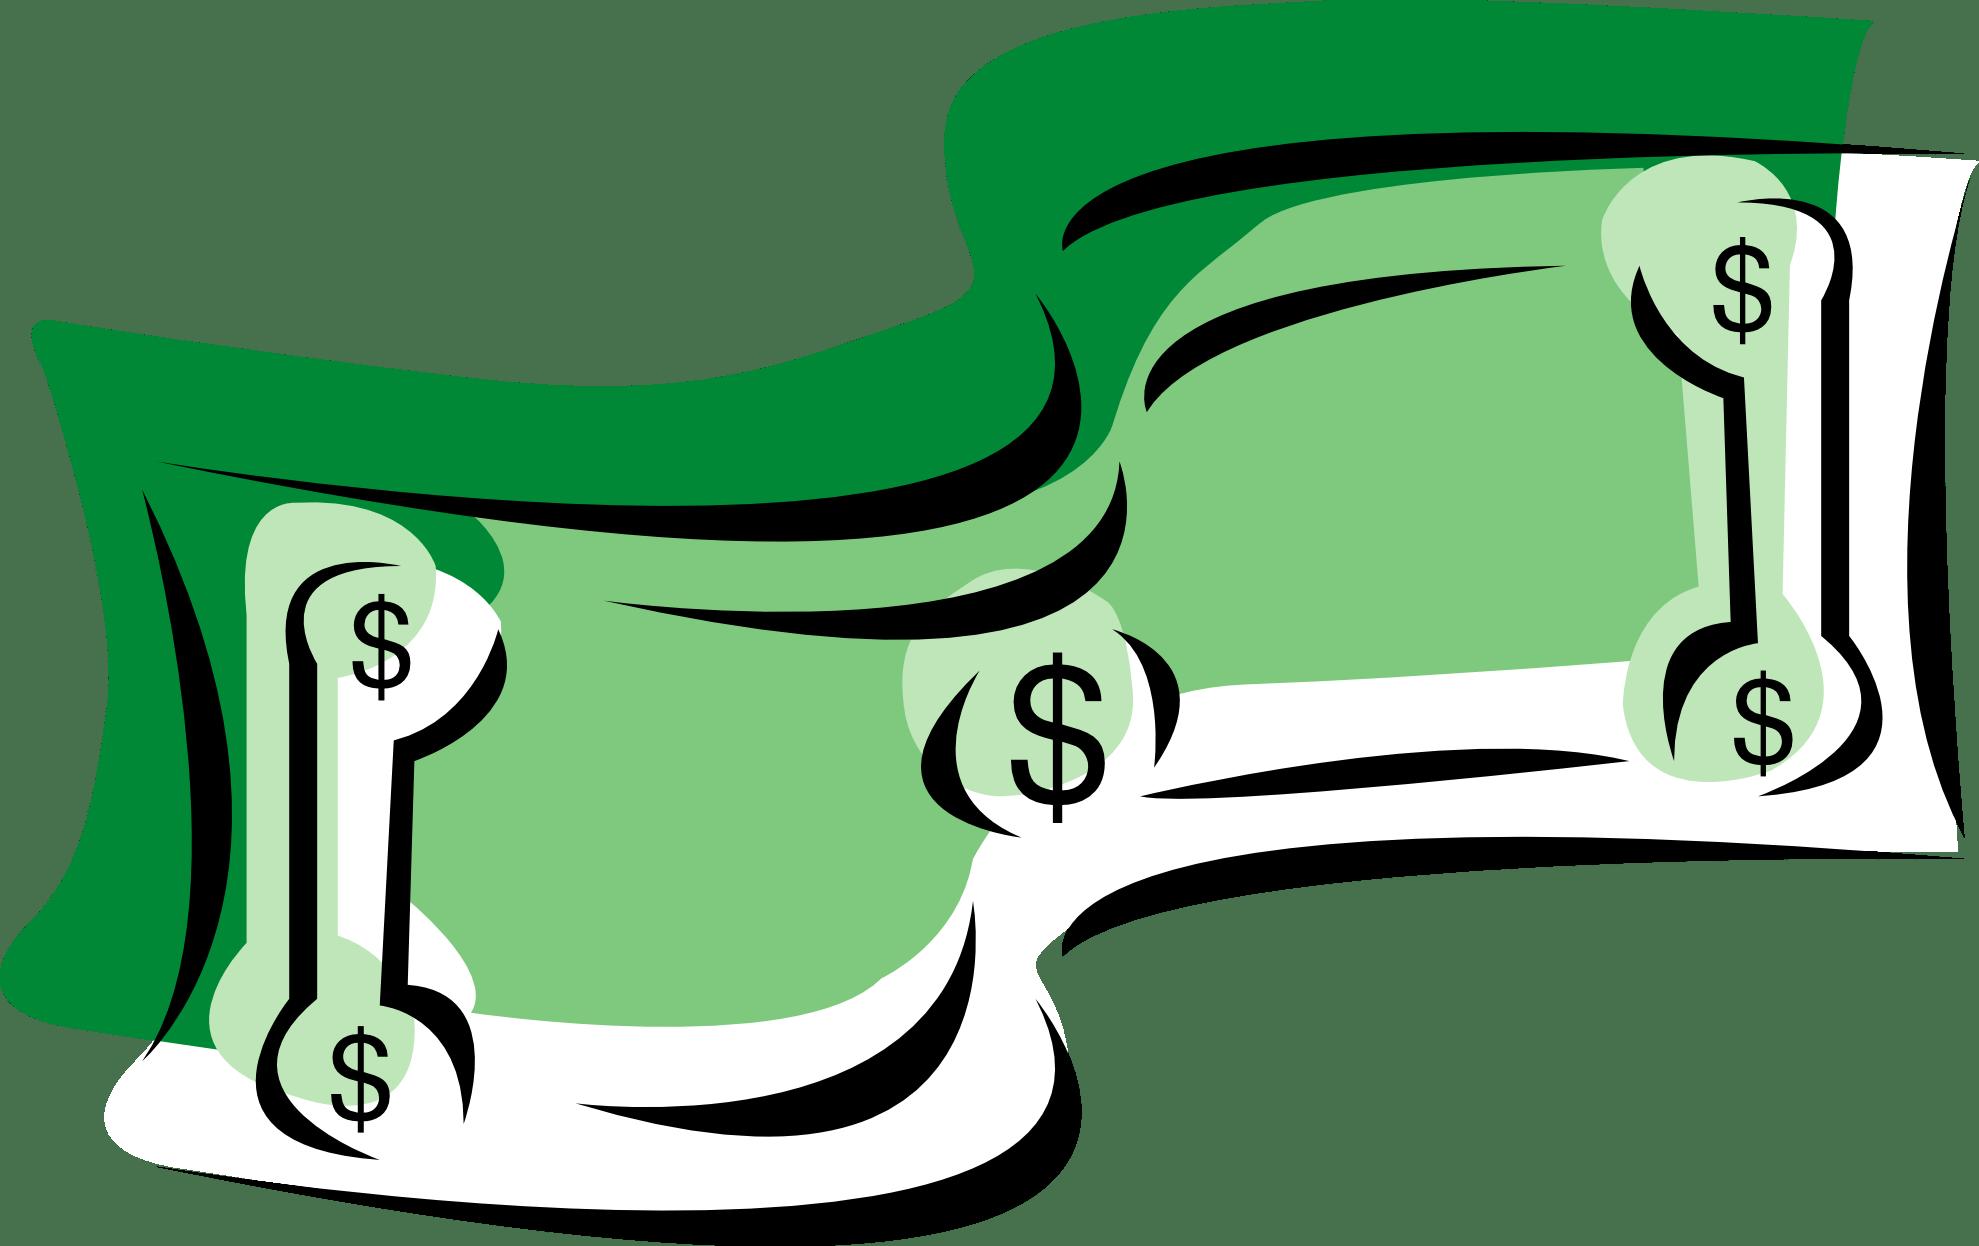 Money for teacher clipart clip art transparent download Money clipart teacher, Money teacher Transparent FREE for ... clip art transparent download